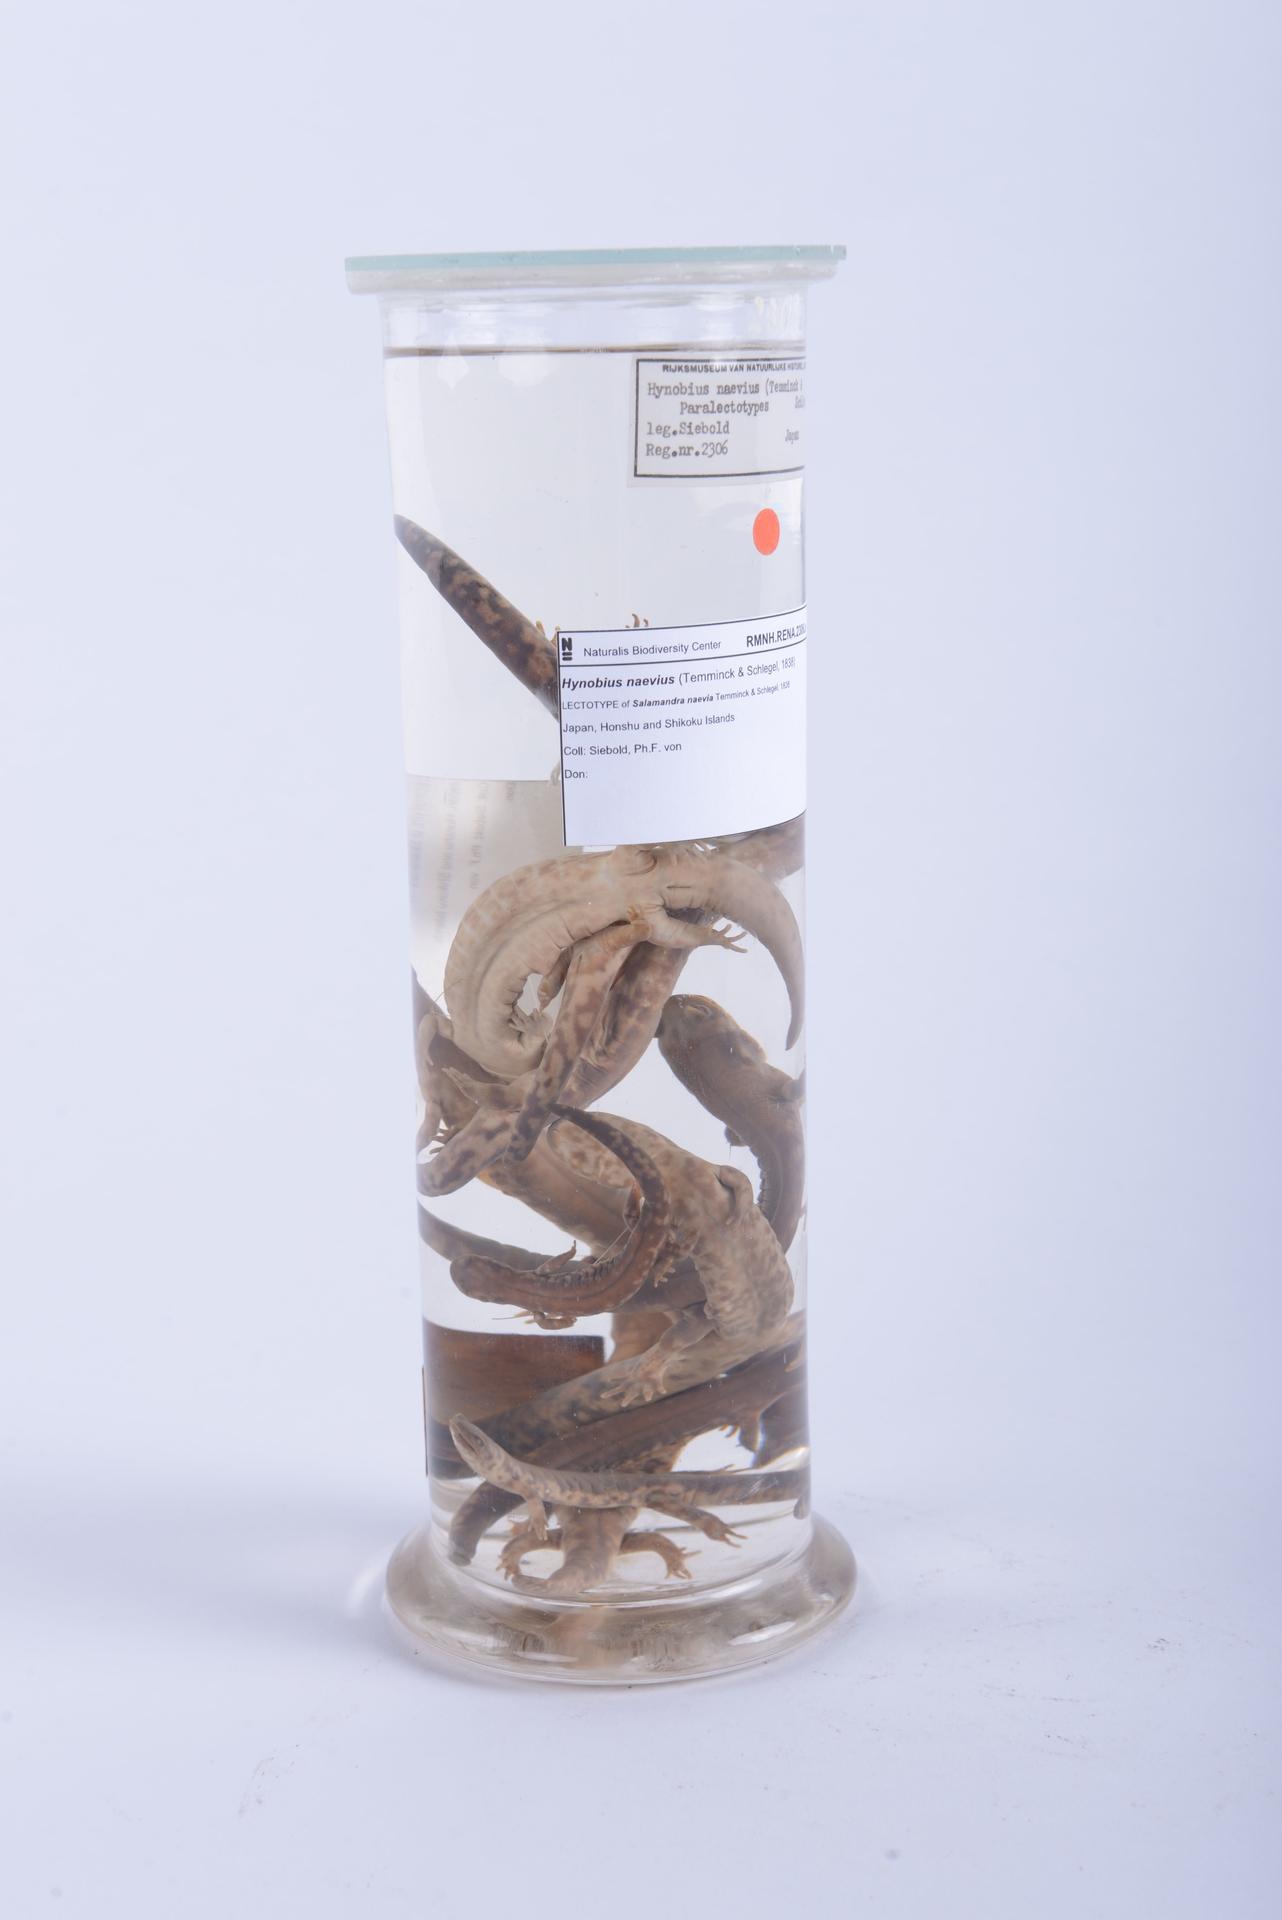 RMNH.RENA.2306.a | Hynobius naevius (Temminck & Schlegel, 1838)